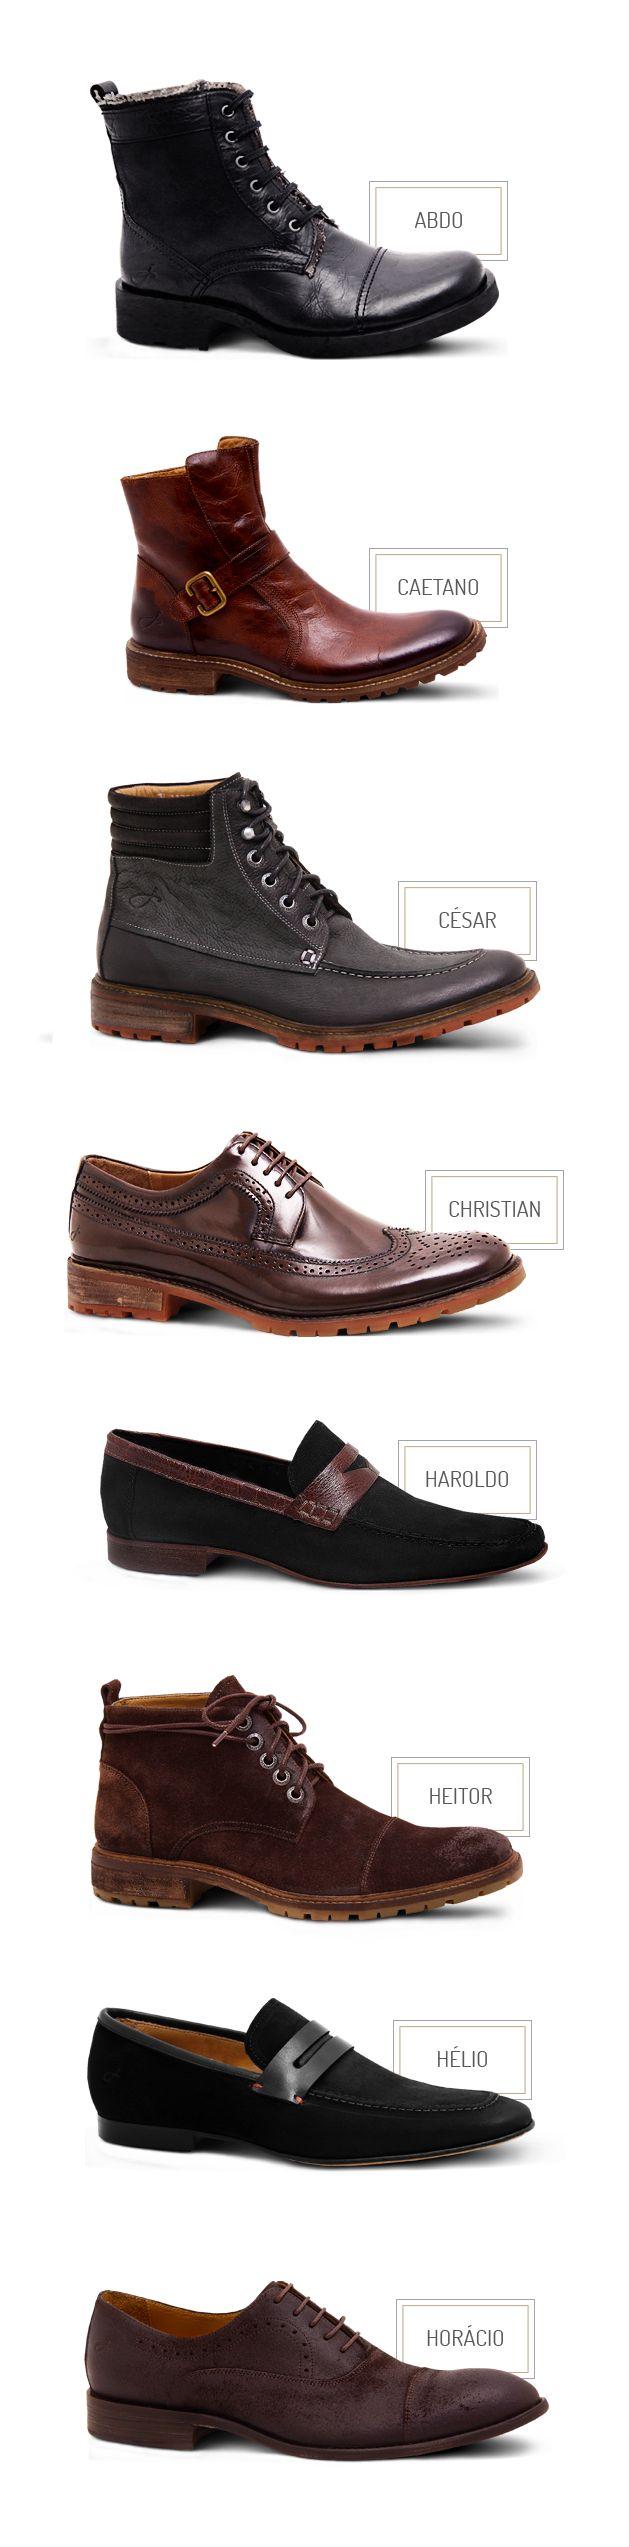 Mejores 76 imágenes de Sapatos legais en Pinterest   Zapatos ...